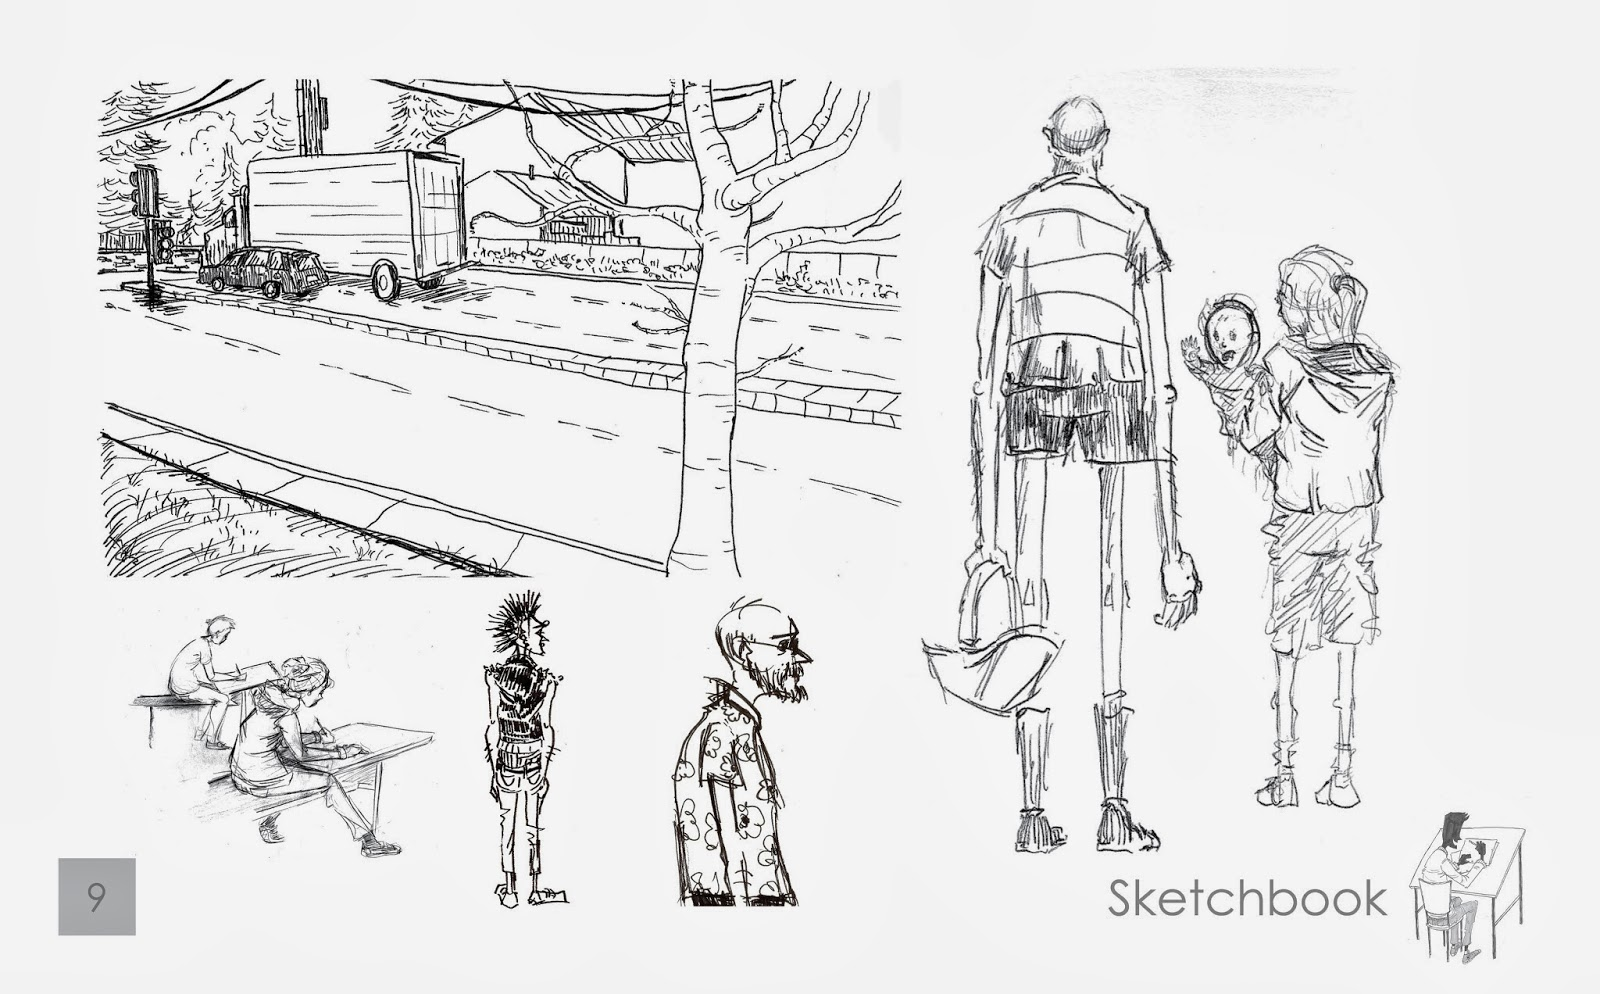 The Sketch Blog of Ryan Eways: Portfolio Review